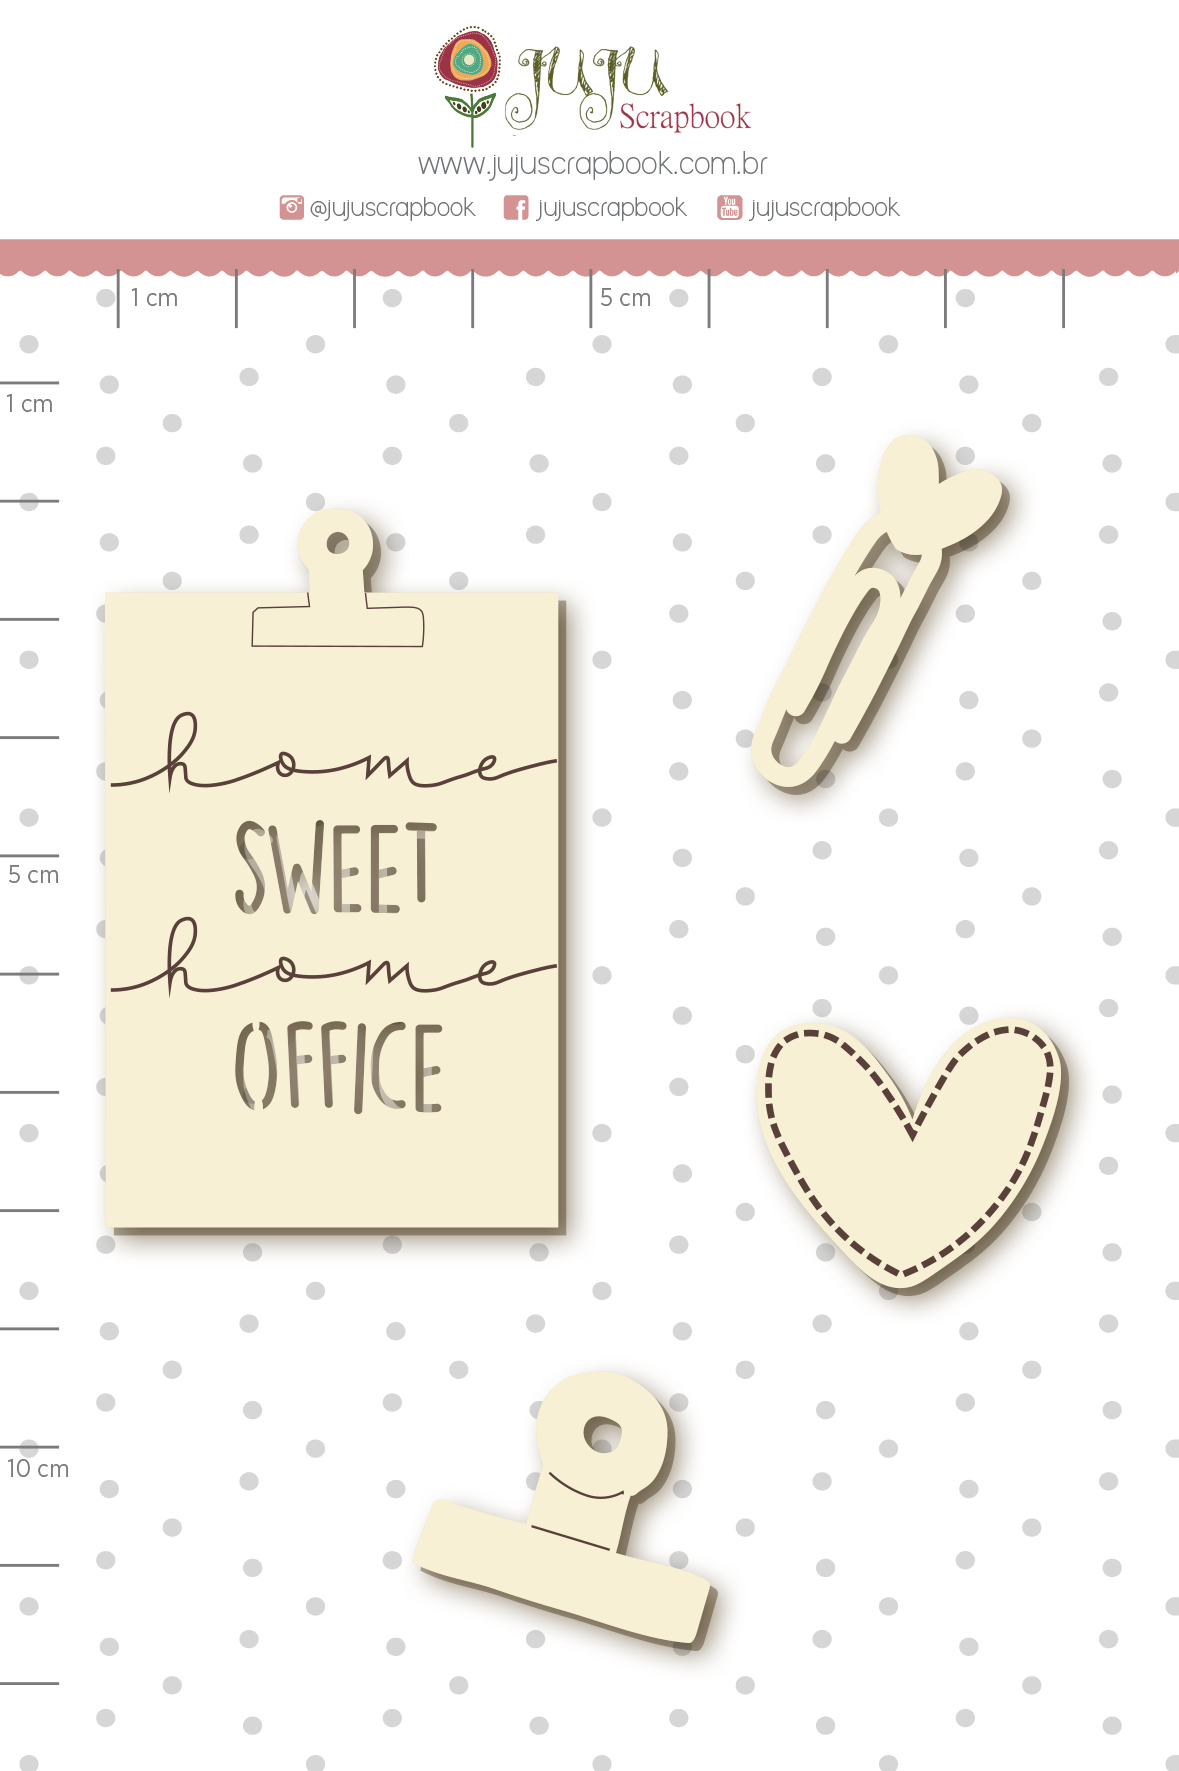 Enfeite Chipboard Branco Home Sweet Home Office - Coleção Quarentena Criativa - Juju Scrapbook  - JuJu Scrapbook